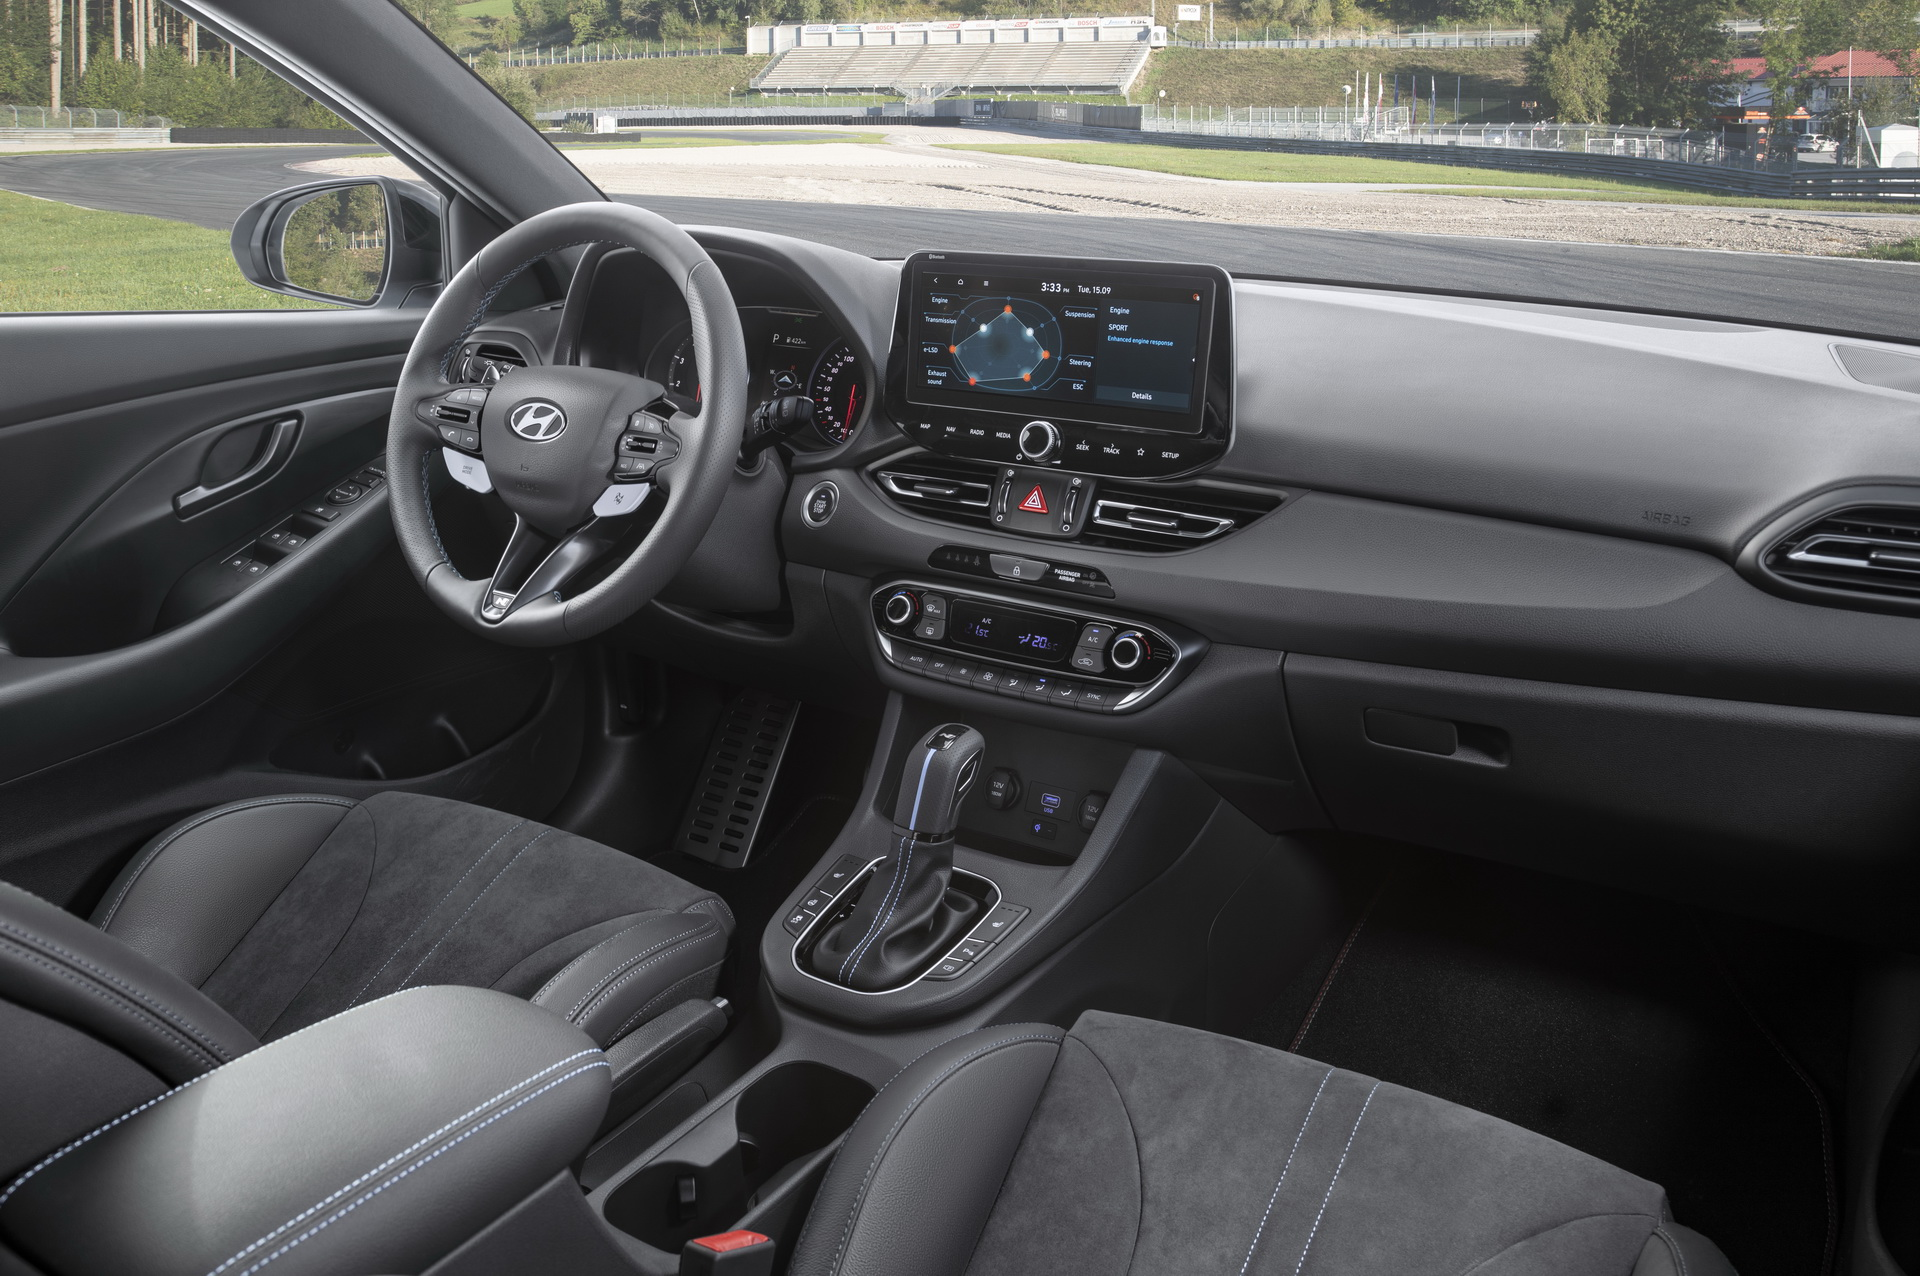 2021-hyundai-i30-n-facelift-unveiled-10.jpg